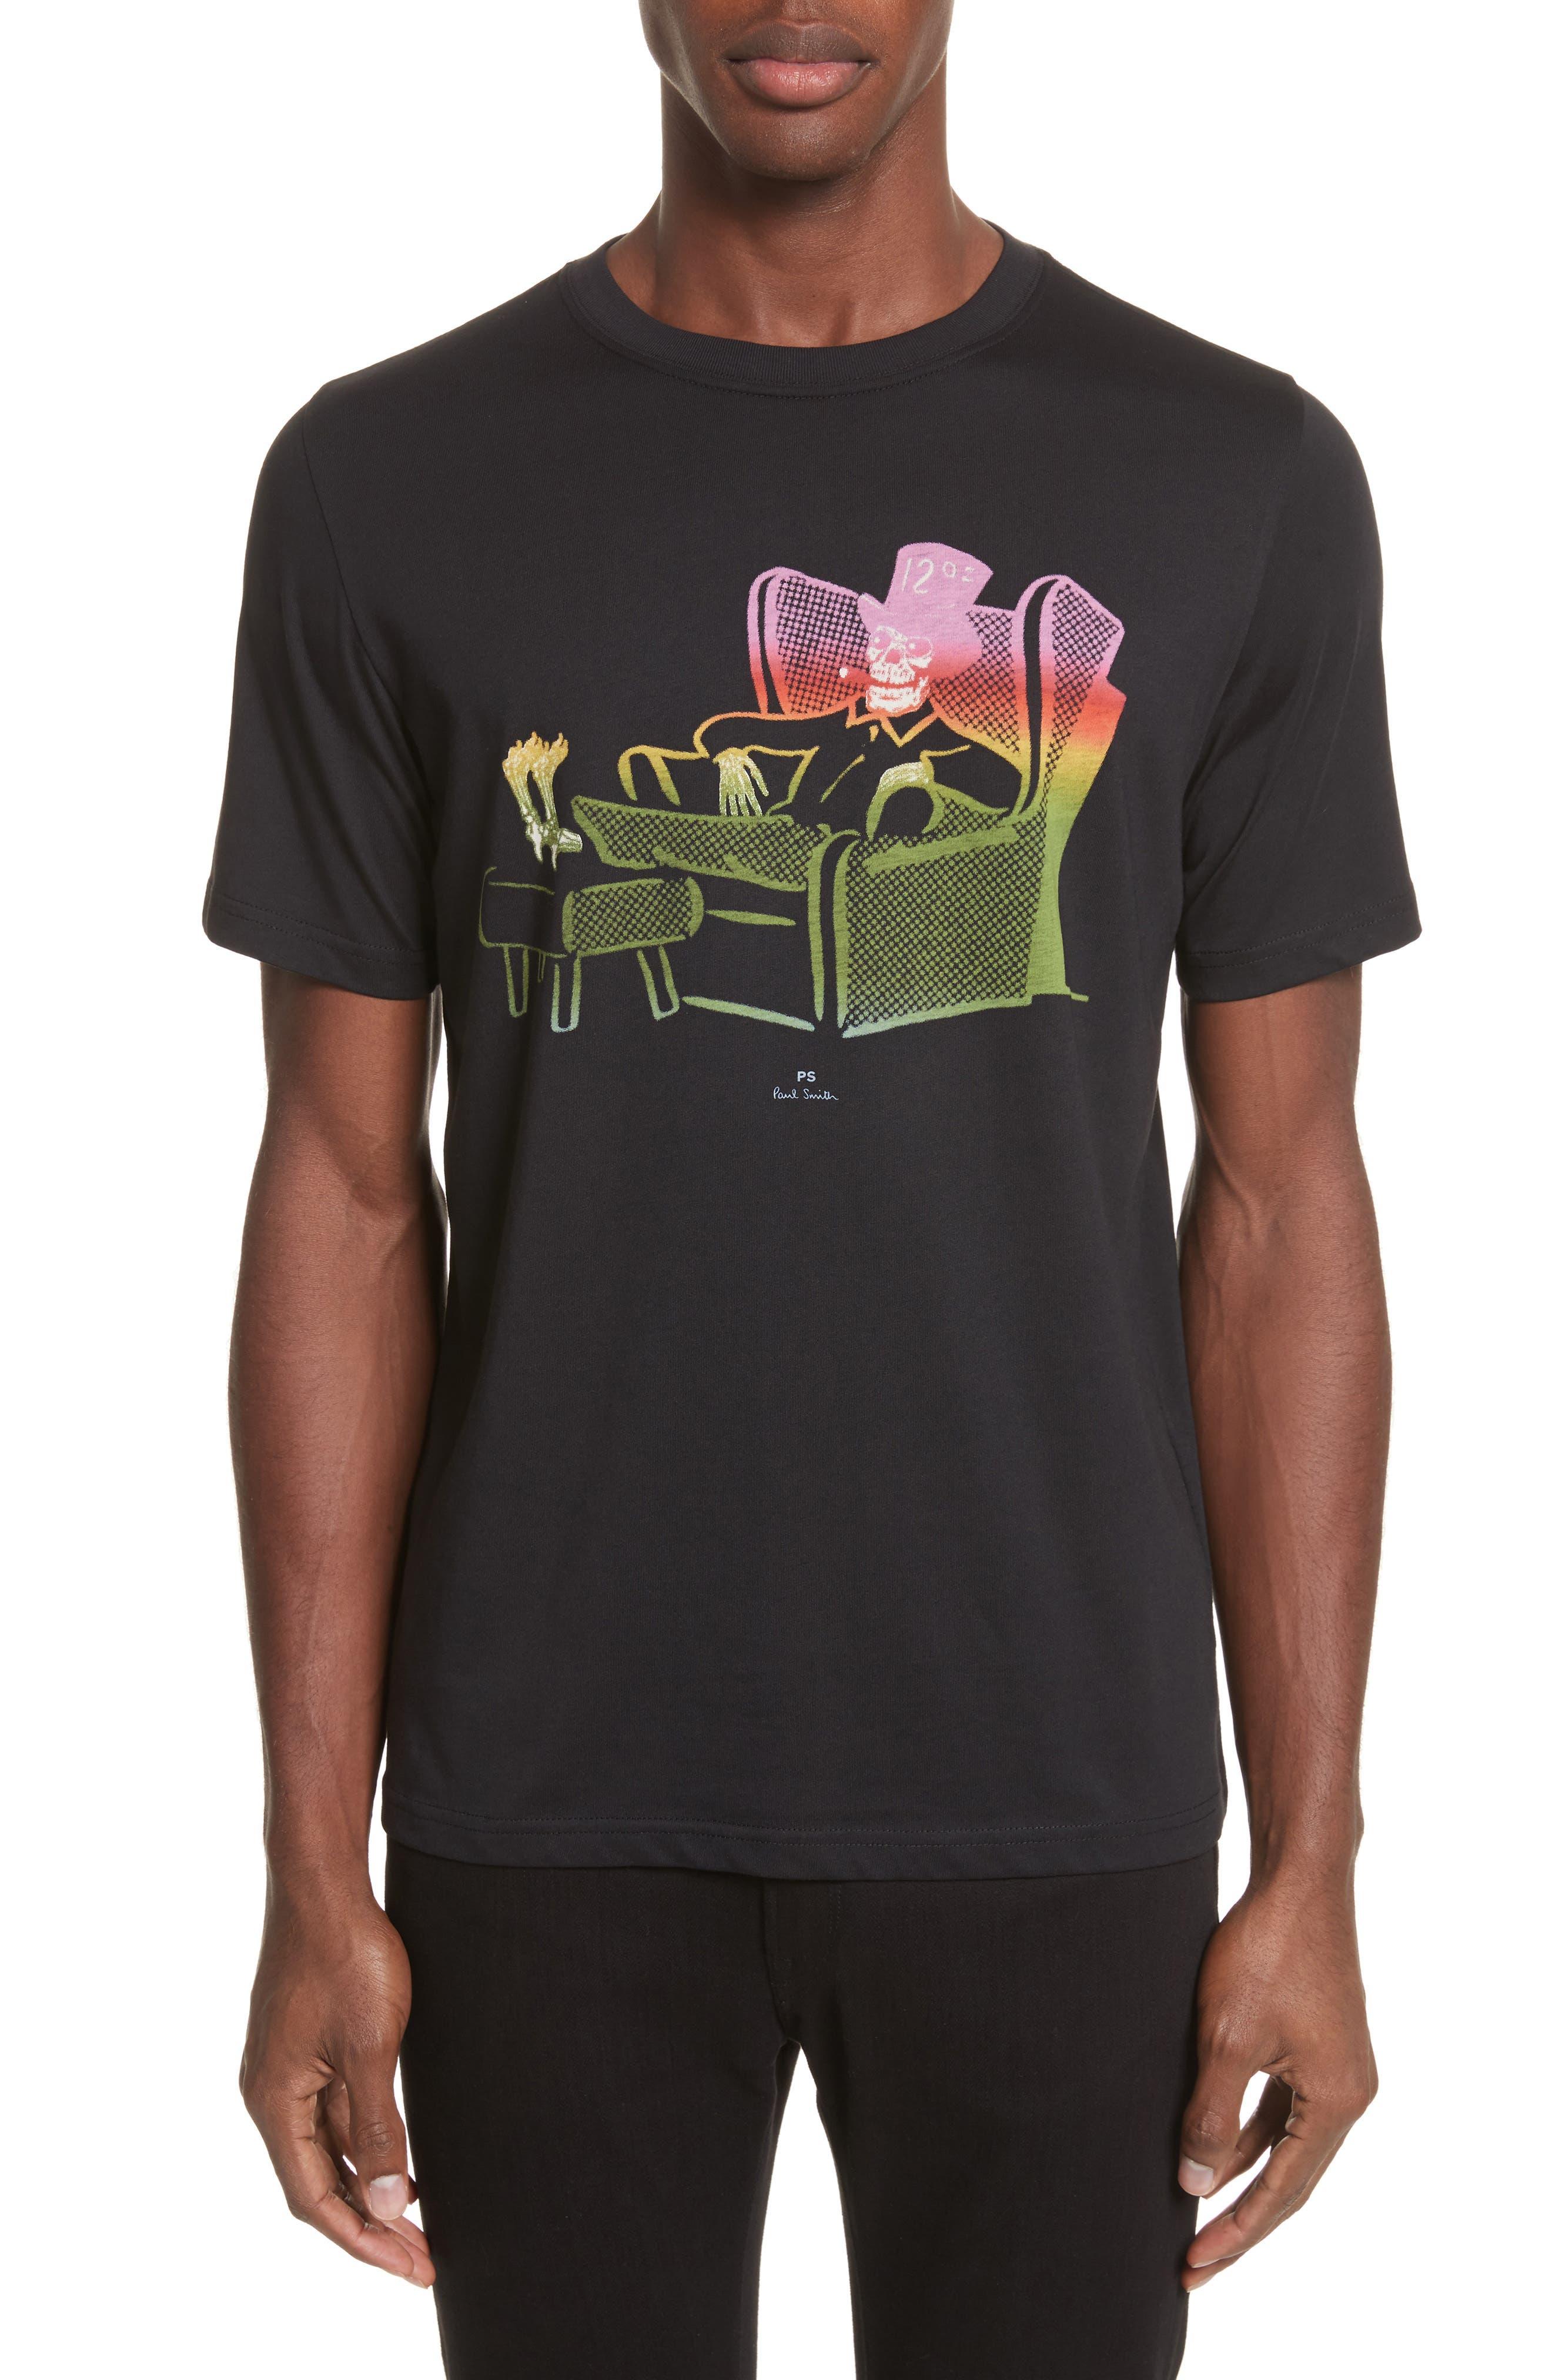 12oz Skeleton Graphic T-Shirt,                             Main thumbnail 1, color,                             001